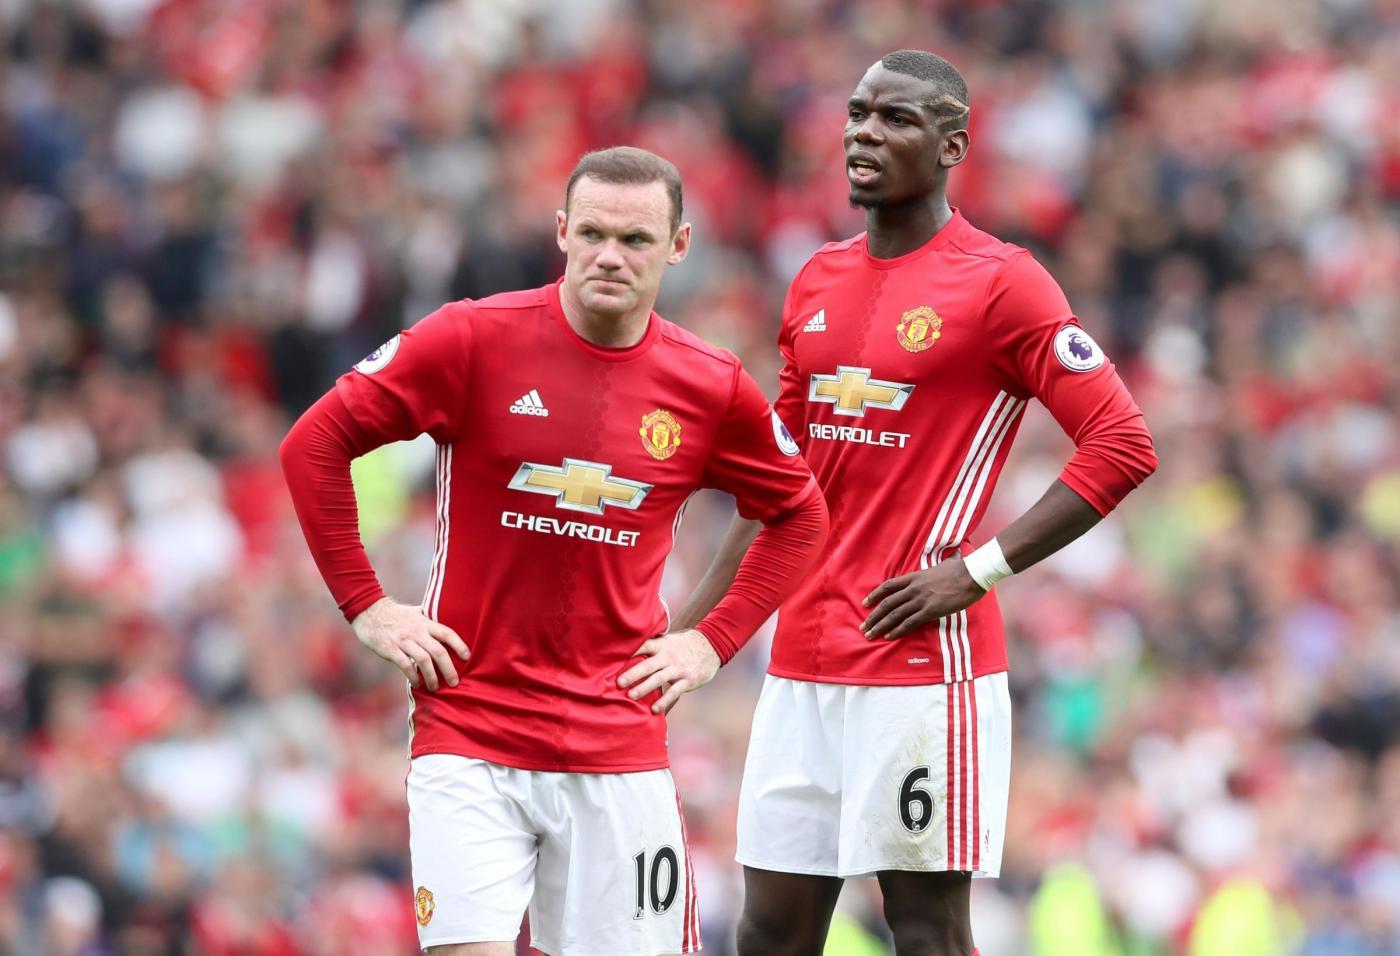 Rooney ubriaco in ritiro, spuntano le foto